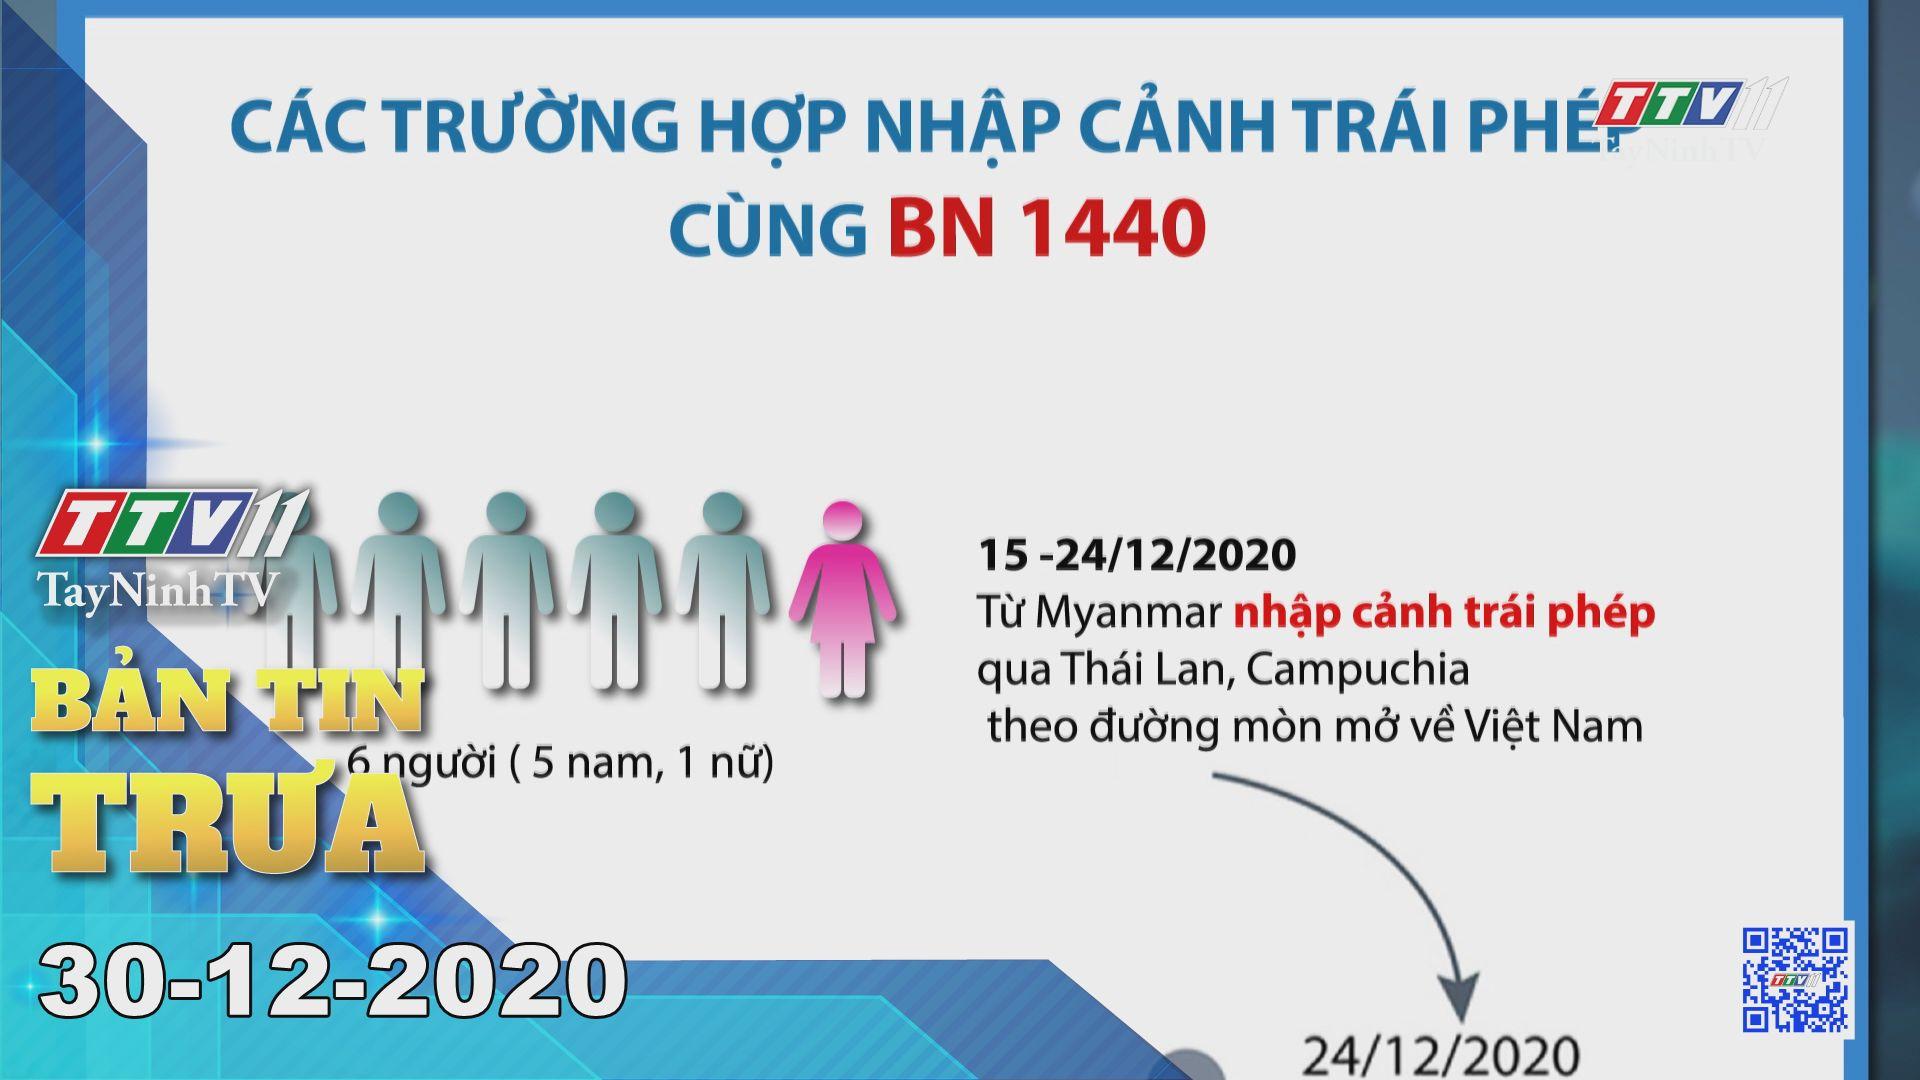 Bản tin trưa 30-12-2020 | Tin tức hôm nay | TayNinhTV